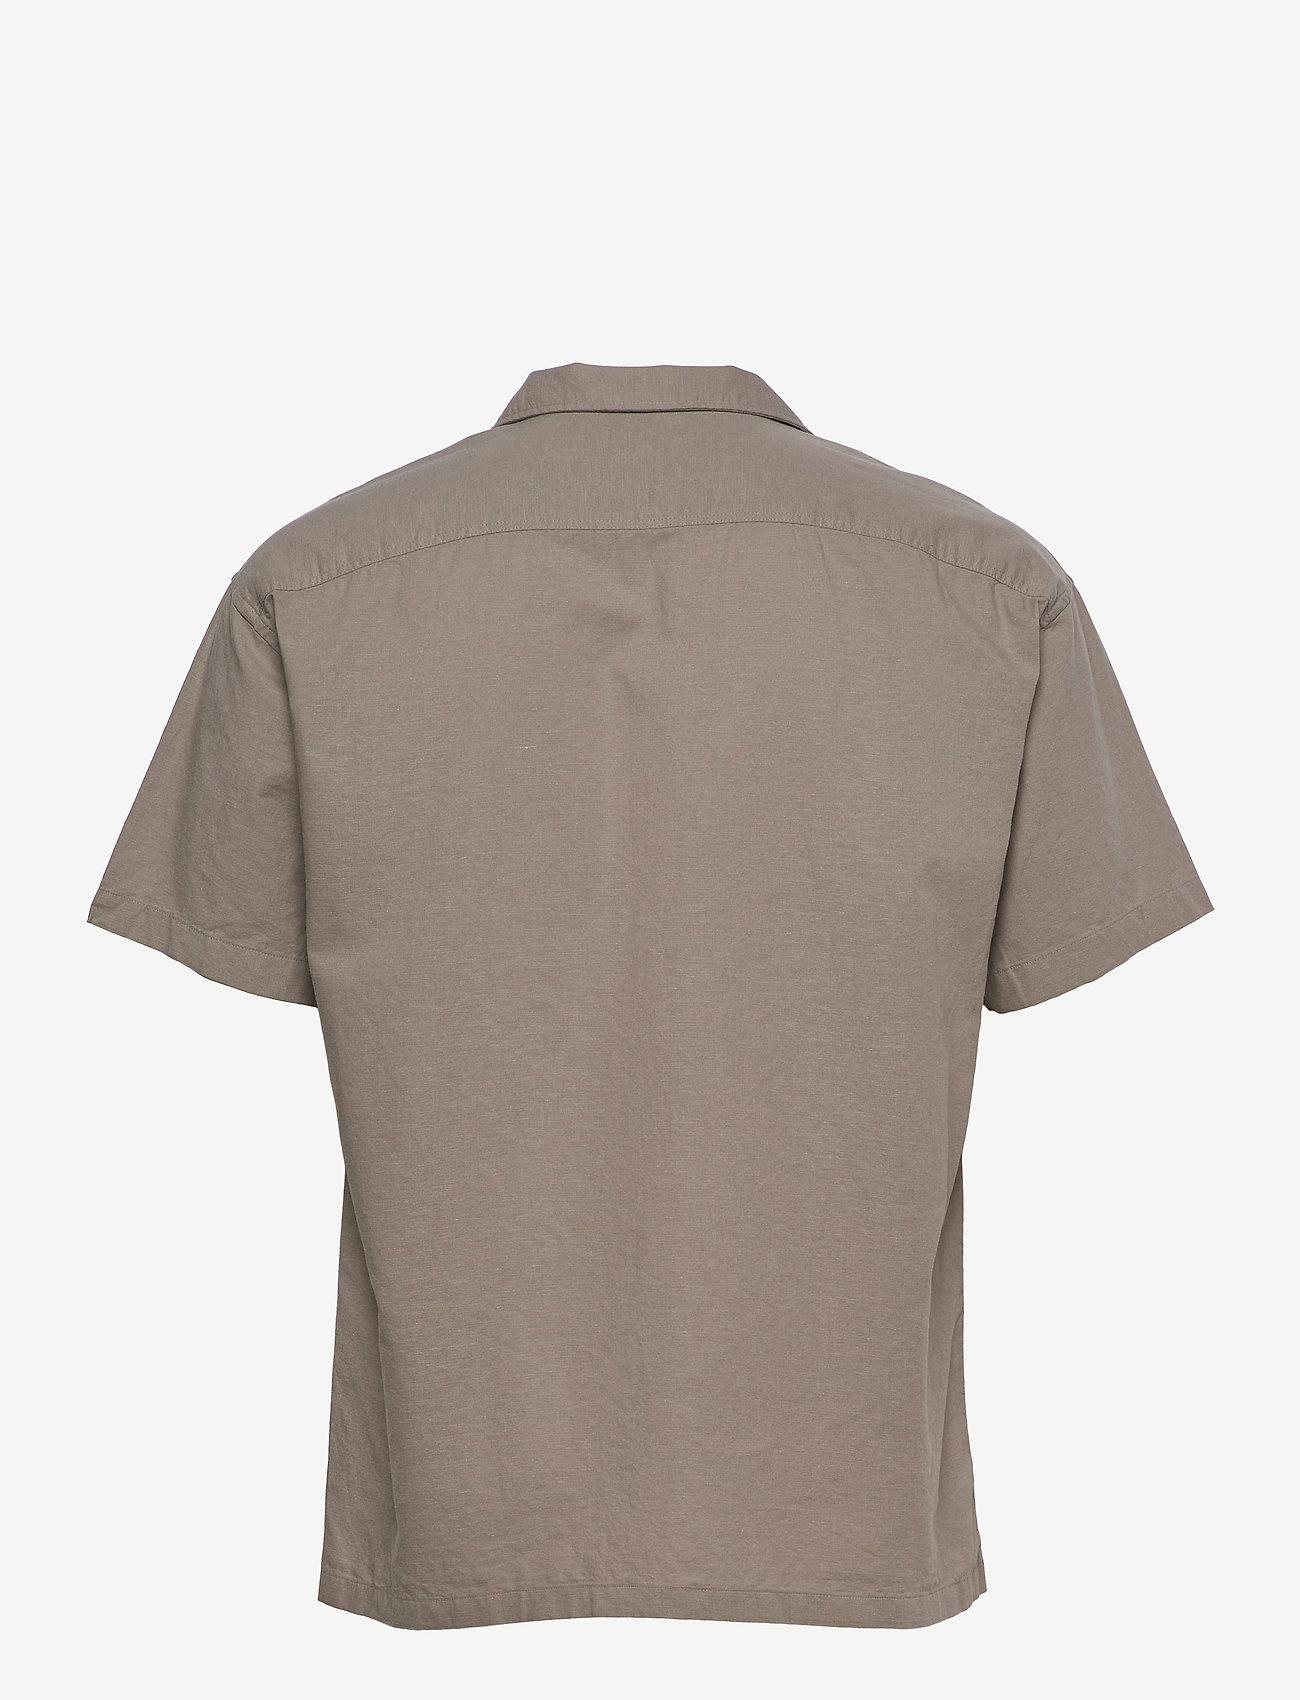 Jack & Jones - JPRBLASUMMER POCKET RESORT SHIRT S/S - basic skjortor - elephant skin - 1